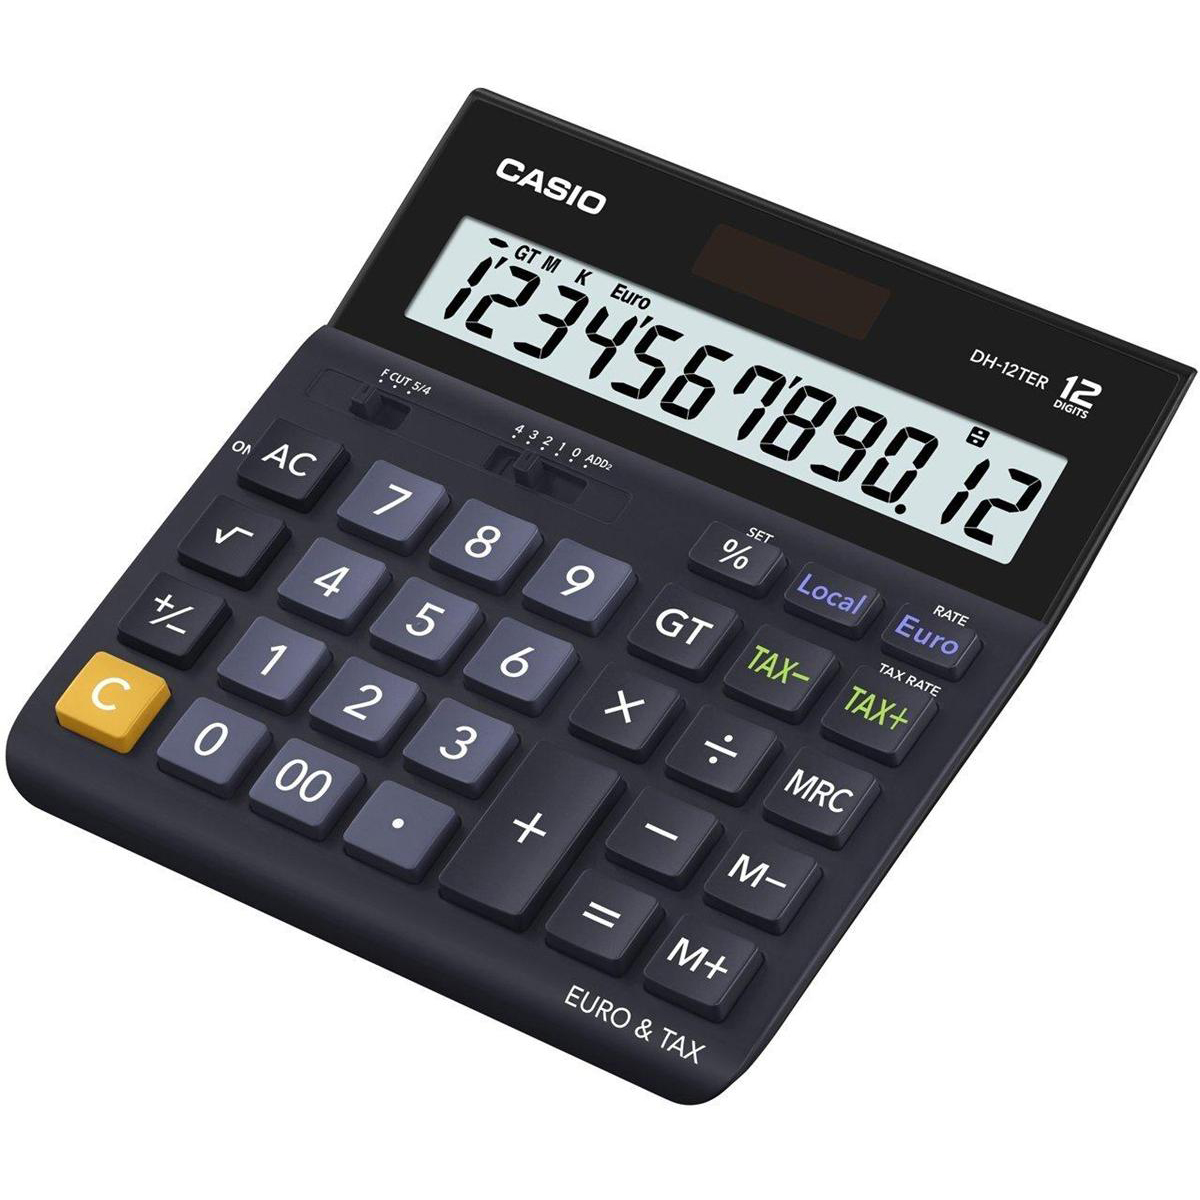 Calculators Casio Desktop Calculator 12 Digit 4 Key Memory Battery/Solar Power 151x32x158mm Black Ref DH-12TER